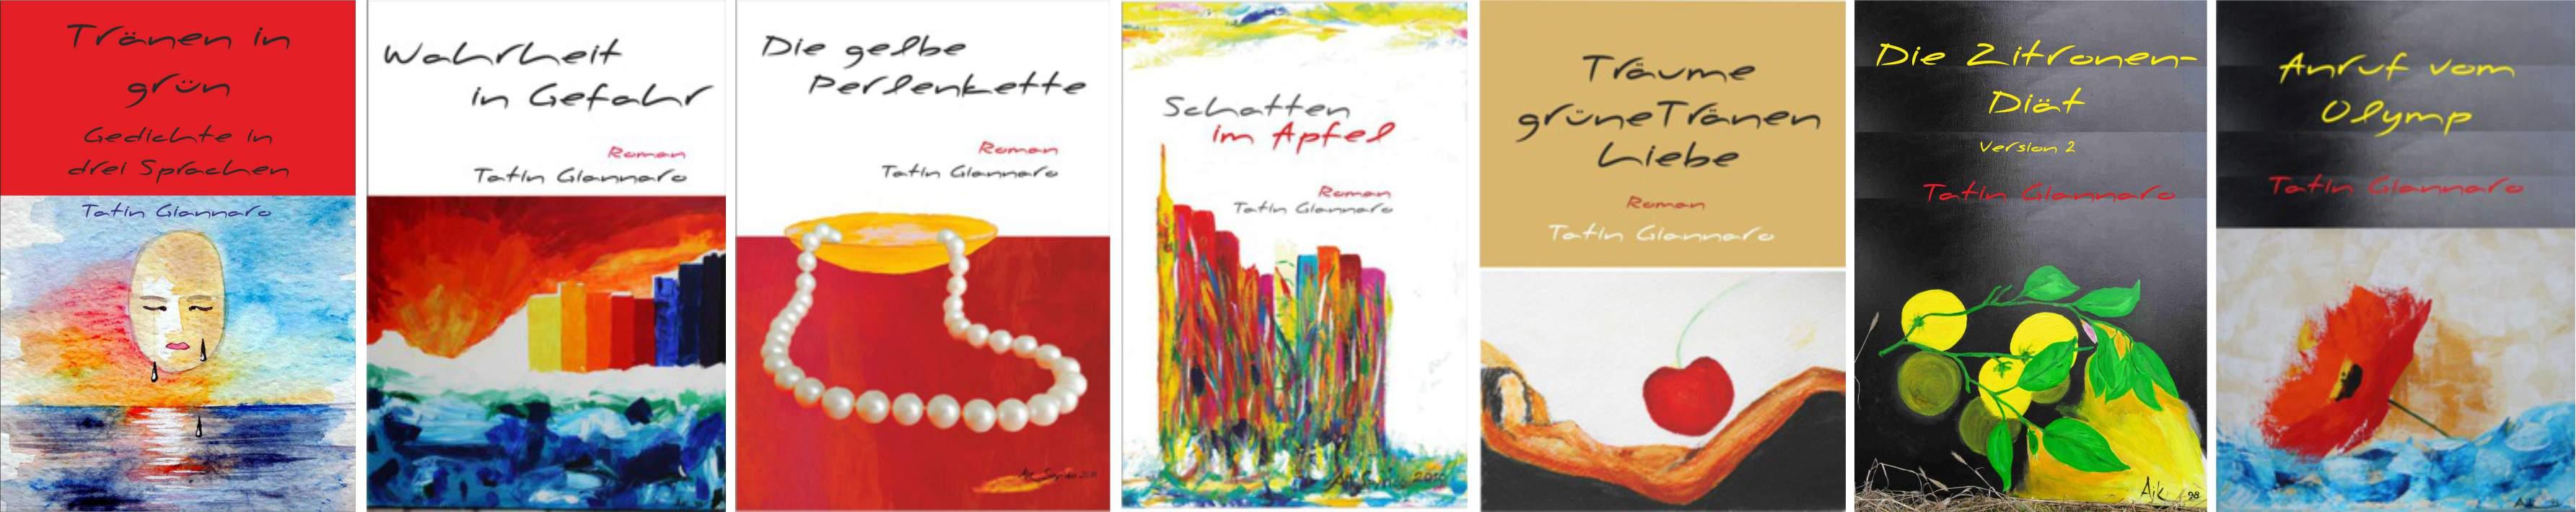 7 Buch-Cover von Tatin Giannaro